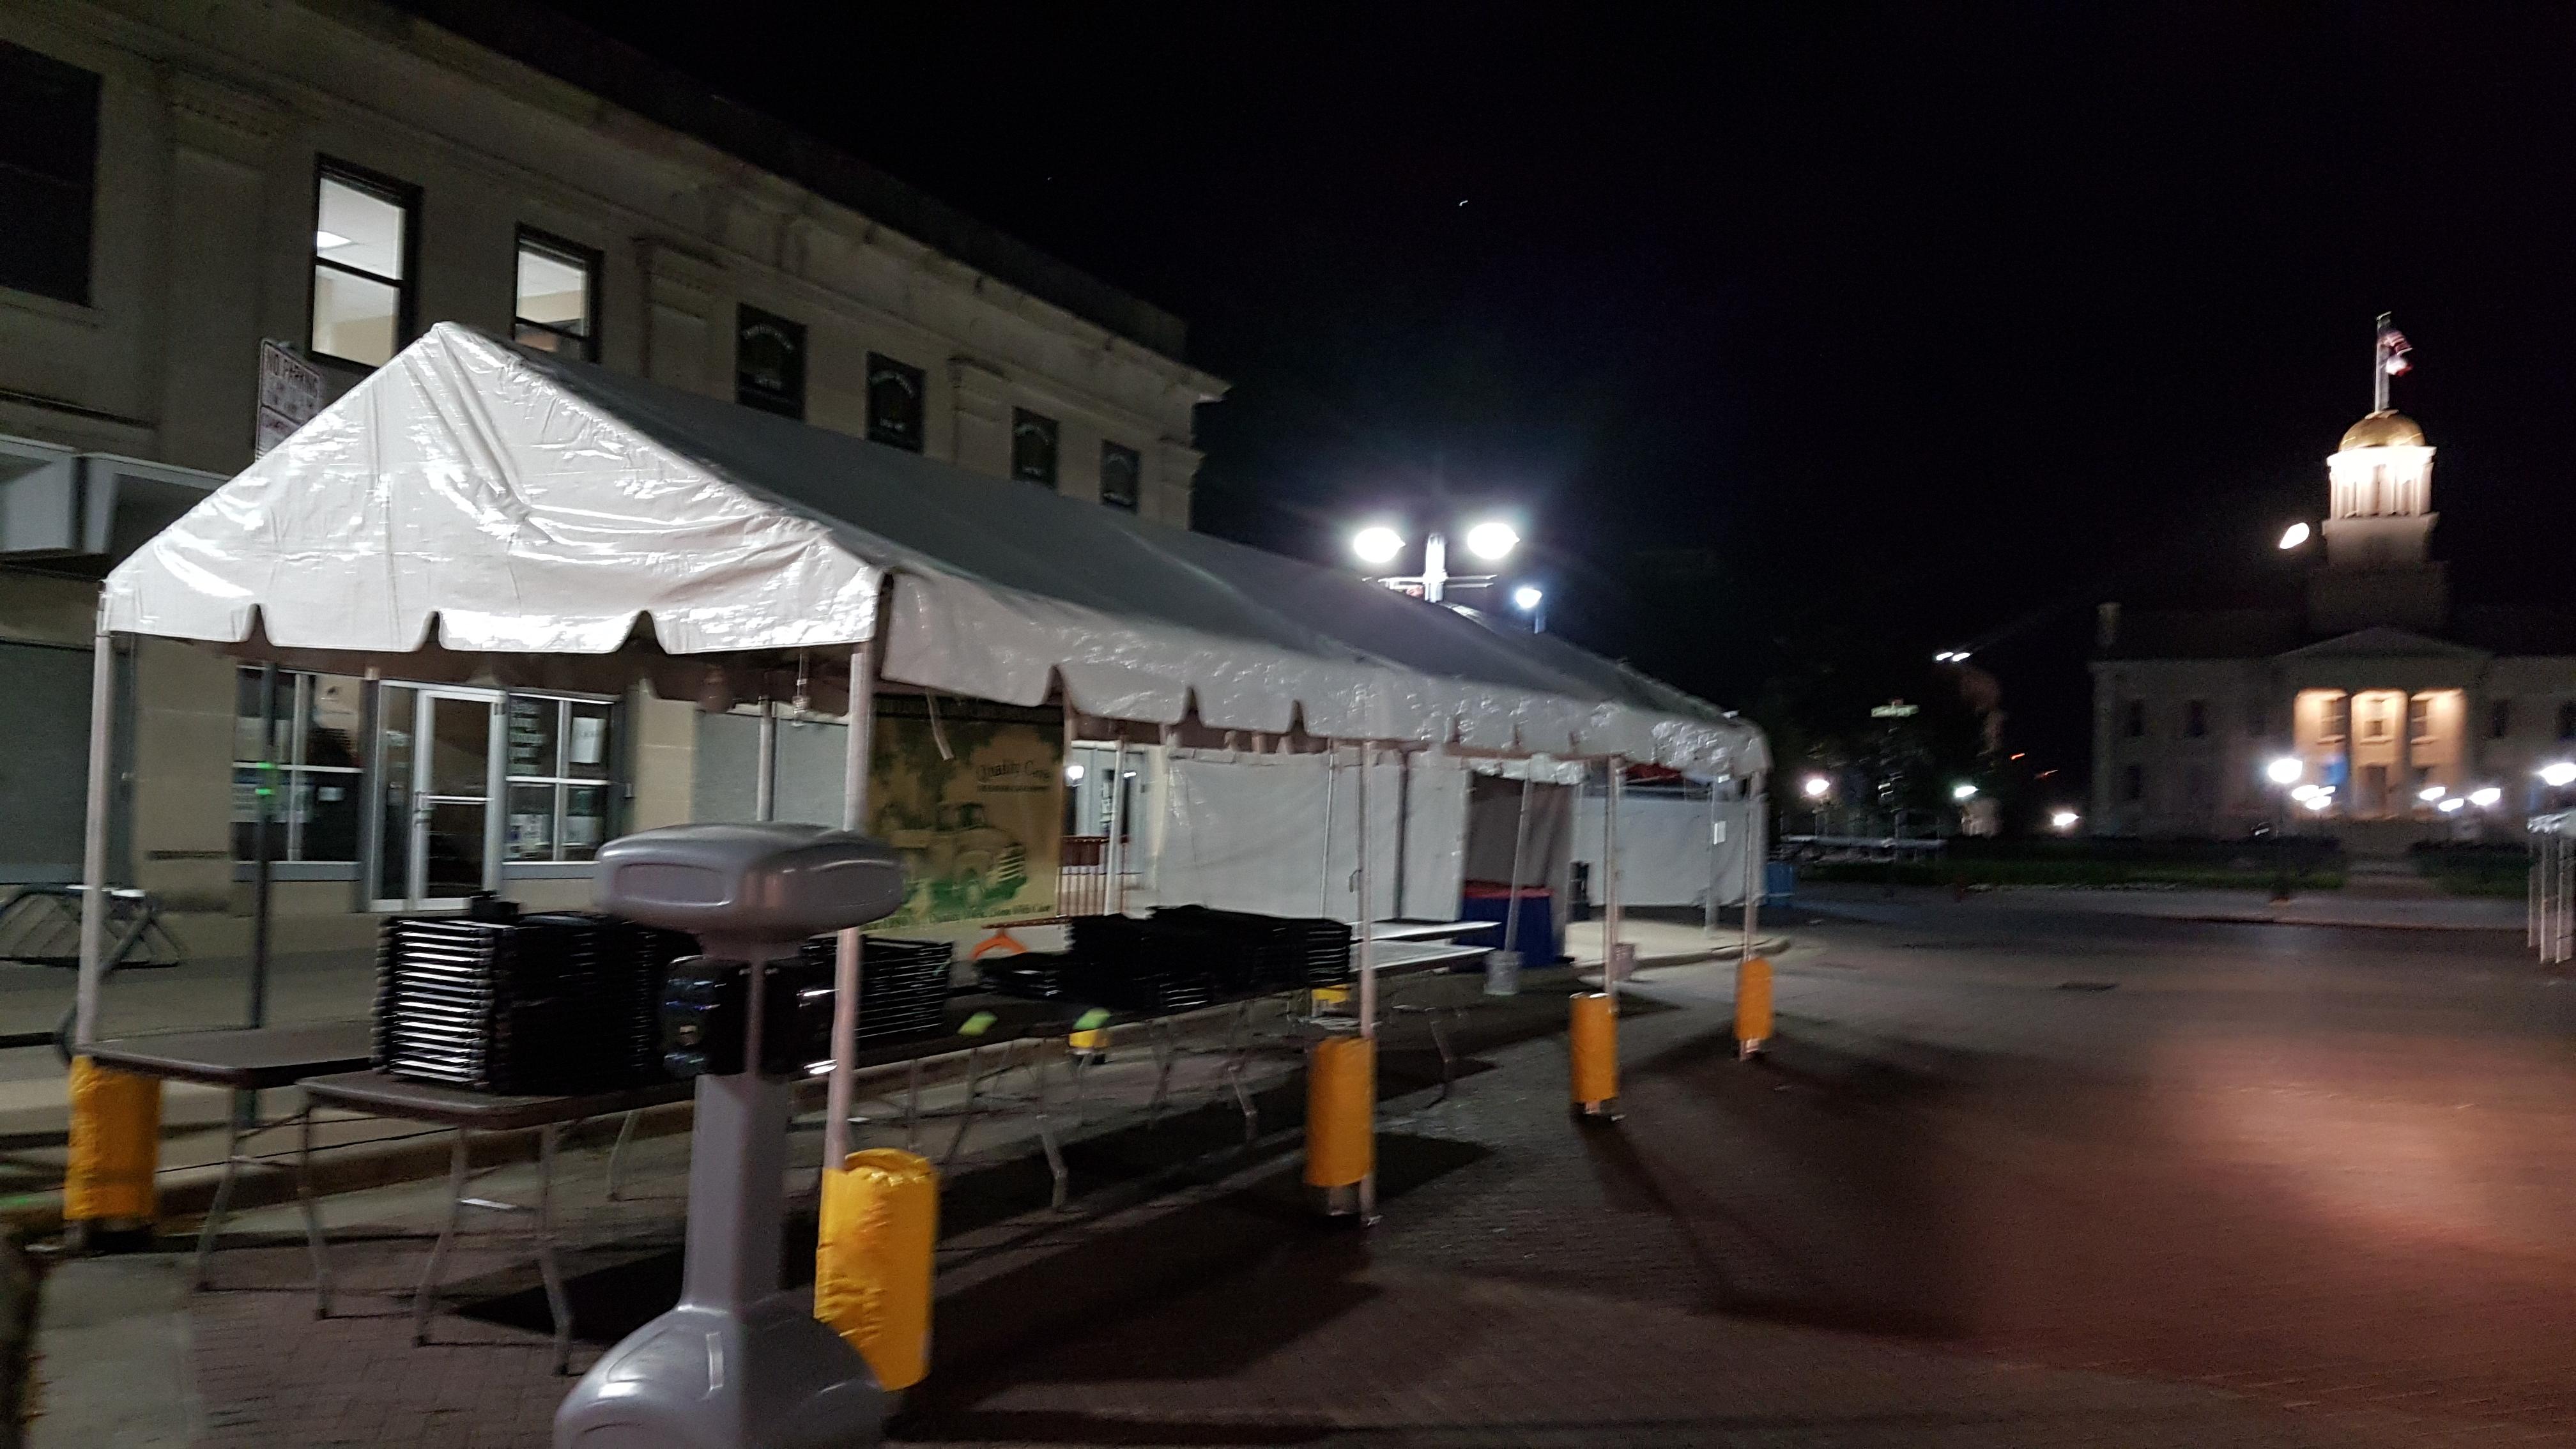 10\' x 30\' frame tent set up at night for an event - Iowa City, Cedar ...